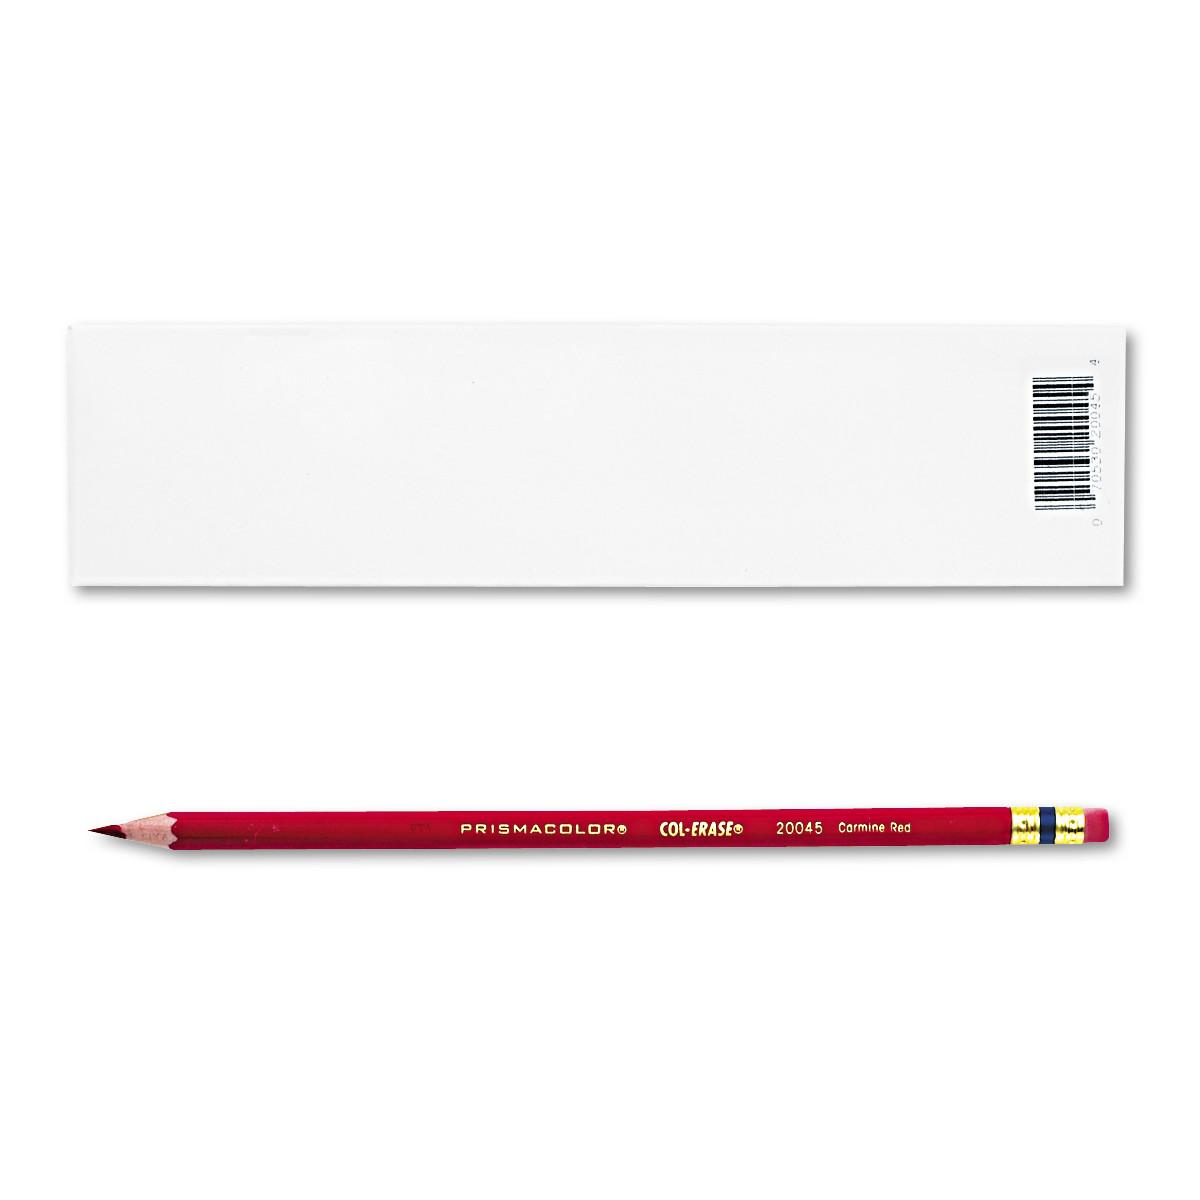 12-Count  Prismacolor Col-Erase Pencil w/Eraser (Carmine Red Lead/Barrel) 2 for $1.96 + Free S/H on $35+